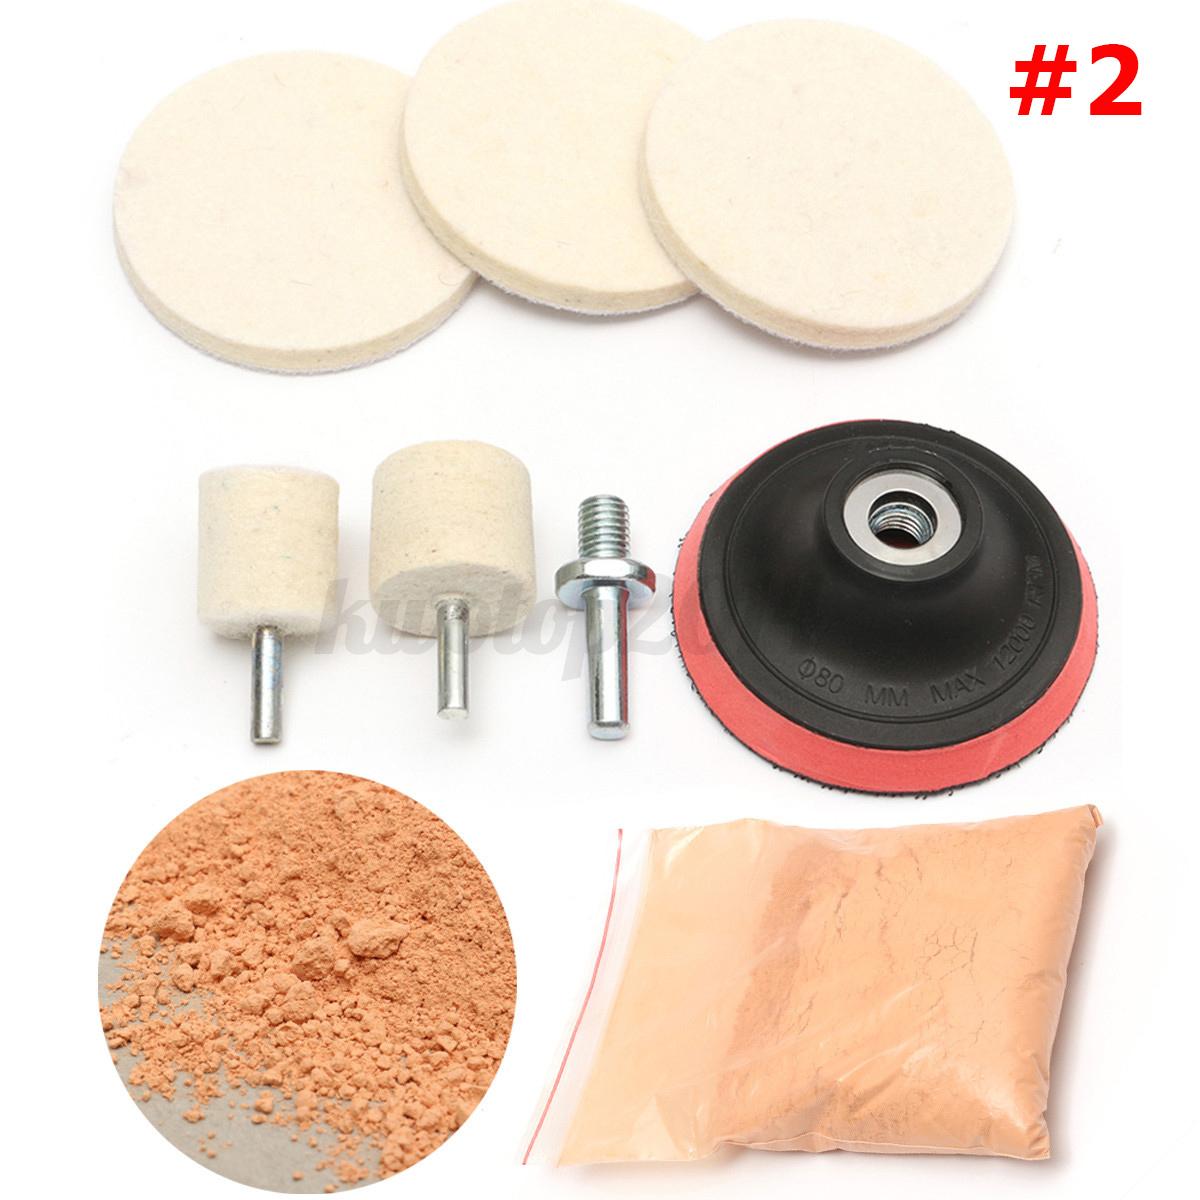 glass polishing kit w cerium oxide powder for car windscreen scratch remover ebay. Black Bedroom Furniture Sets. Home Design Ideas